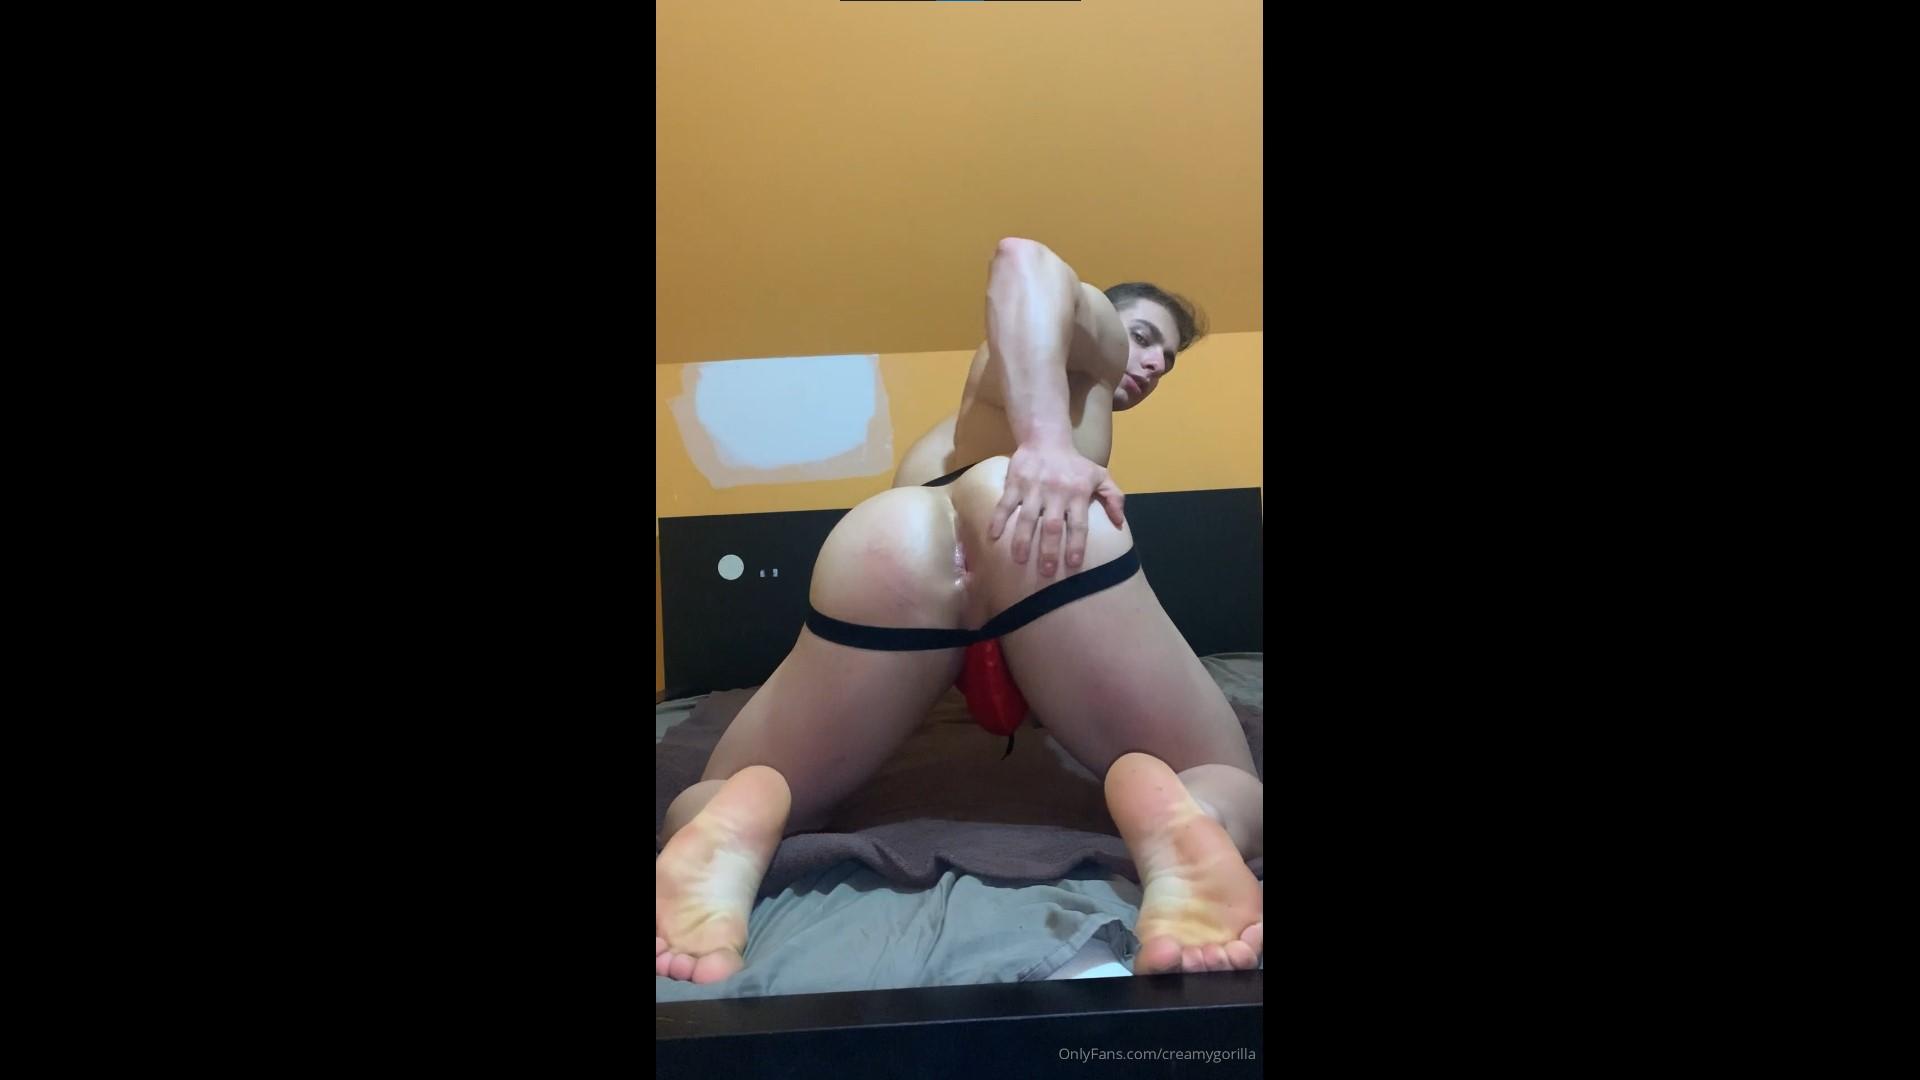 Fucking myself with a butt plug - CreamyGorilla